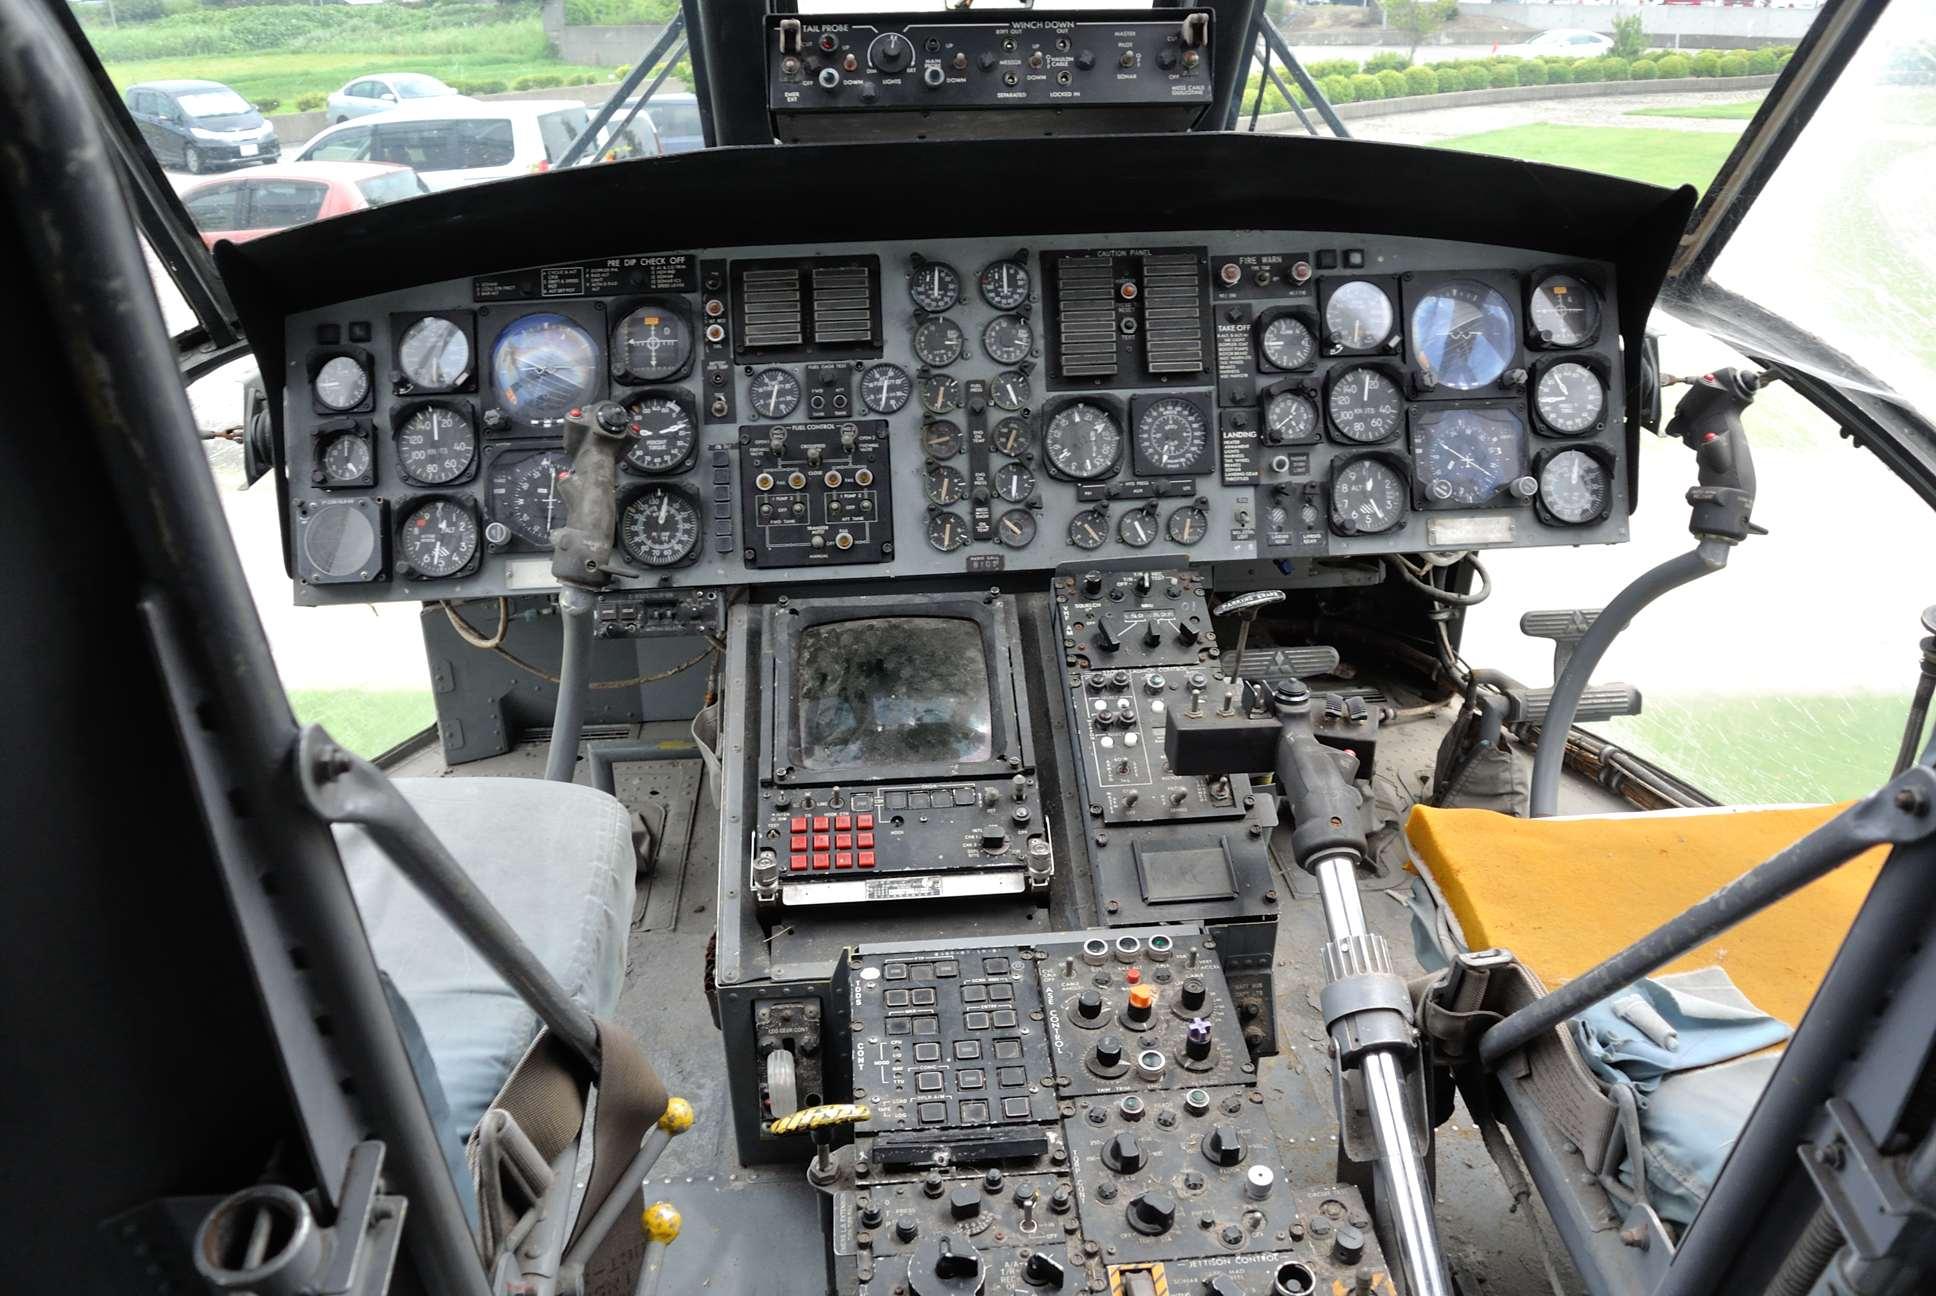 HSS-2Bの内部